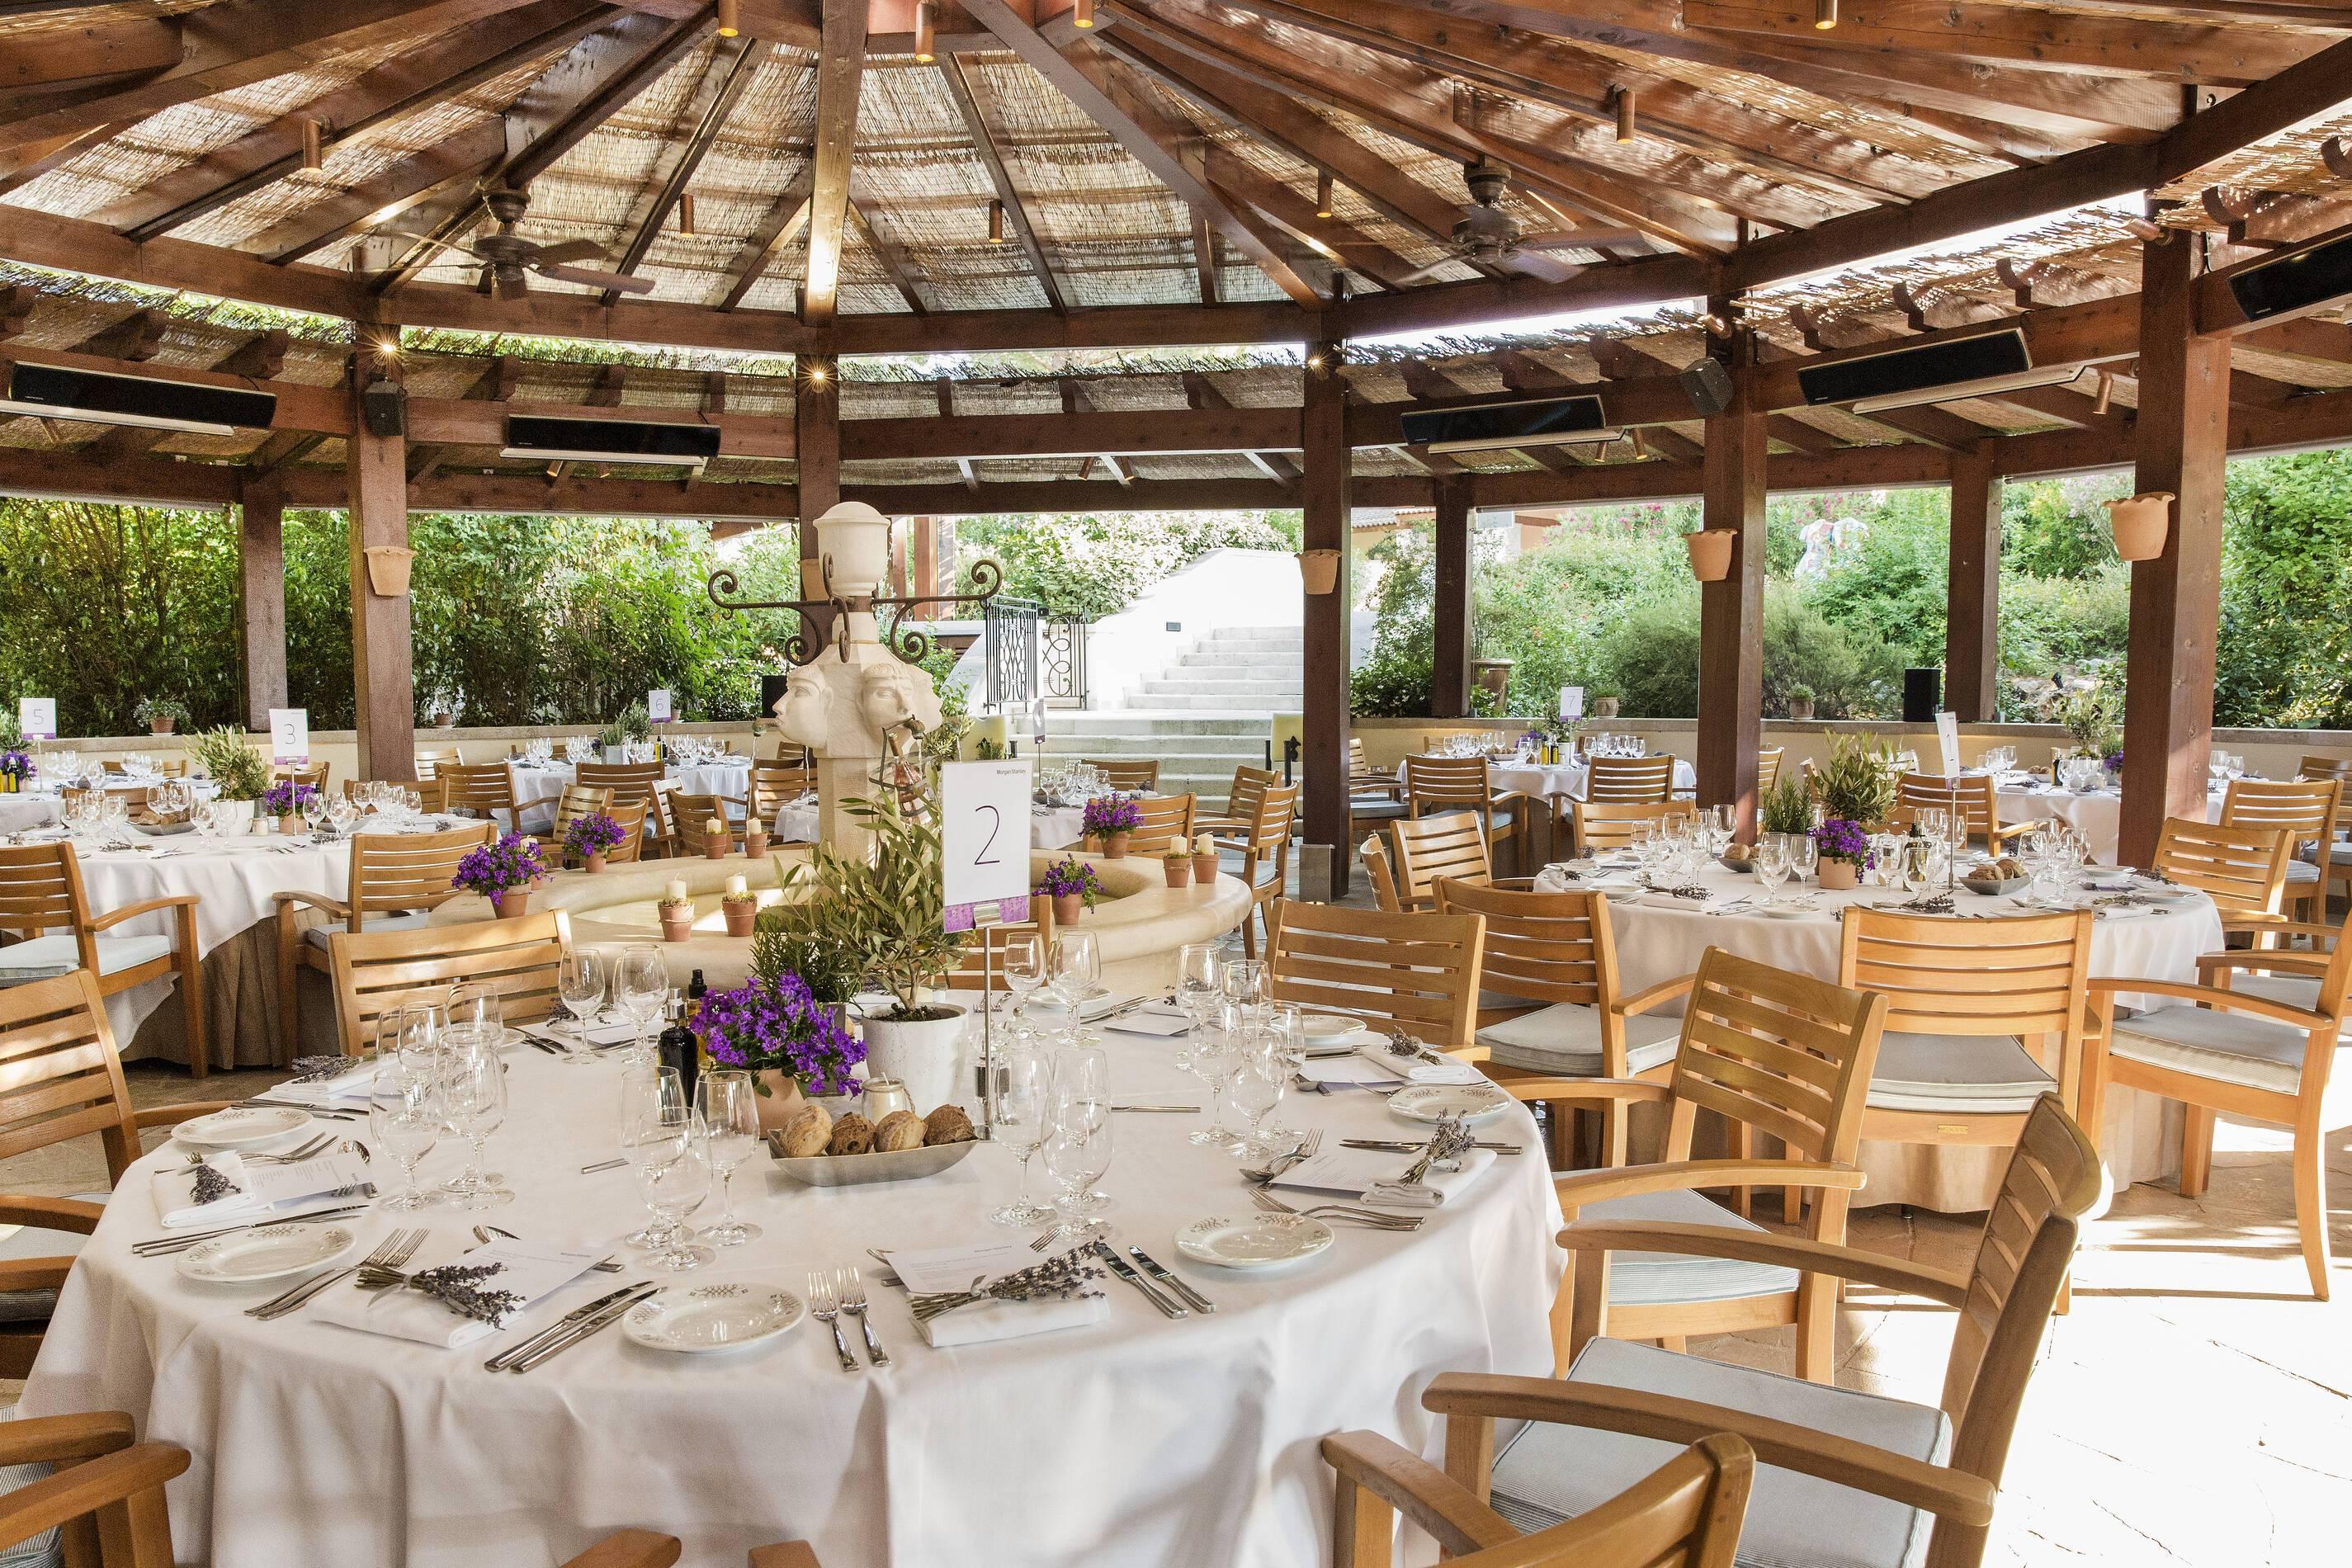 Terre Blanche Restaurant Le Tousco Provence